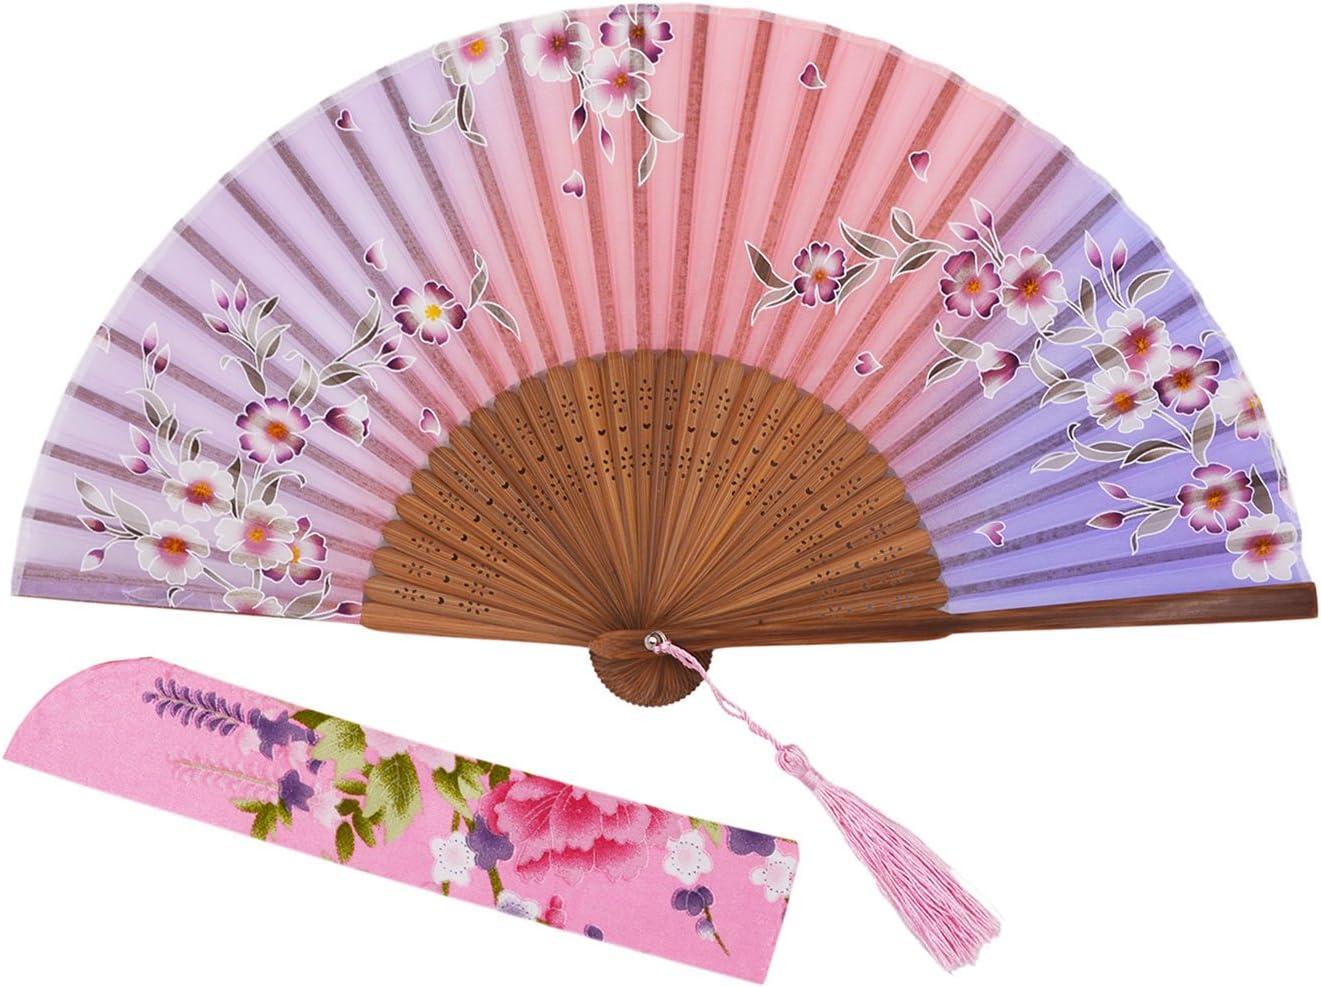 meifan Chinese/Japanses Classical Handmade Vintage Folding Bamboo Silk Flower Pattern Hand Fan MFN (PinkPurple)